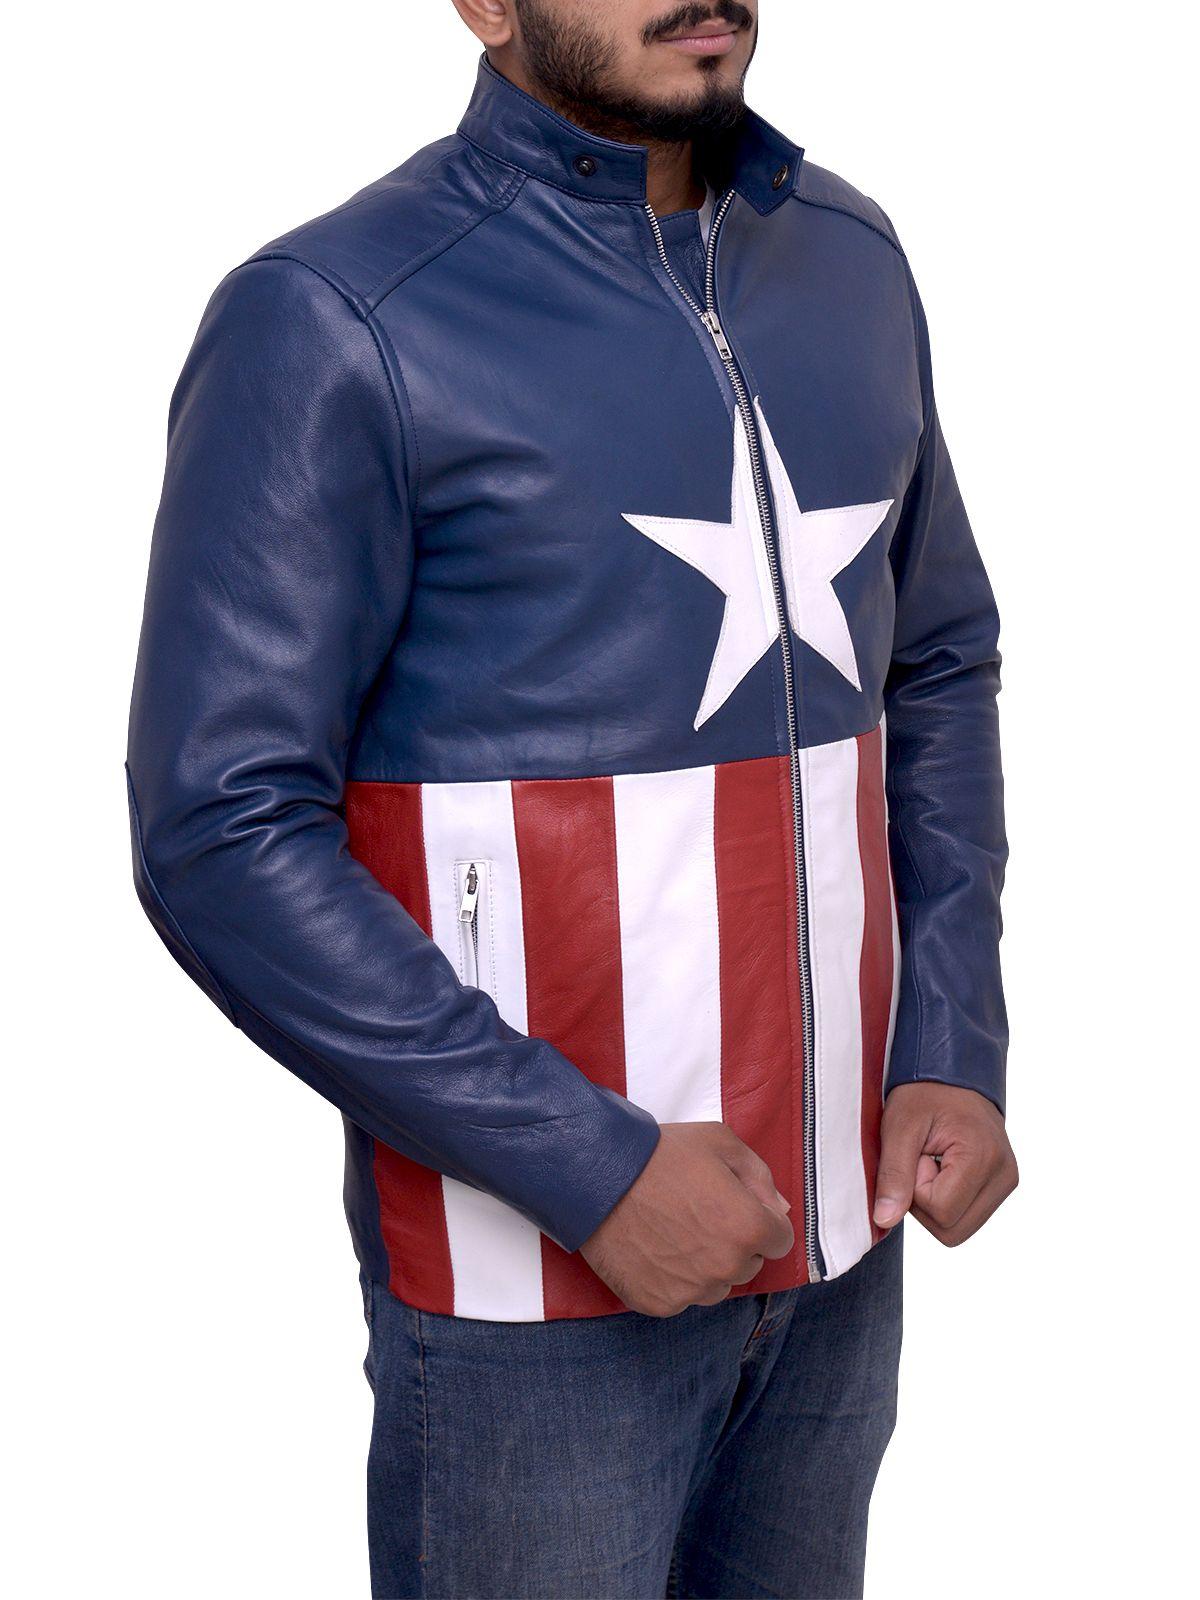 Super Cool American Flag Leather Jacket Men Jacket Mauvetree Leather Jacket Men Yellow Leather Jackets [ 1600 x 1200 Pixel ]